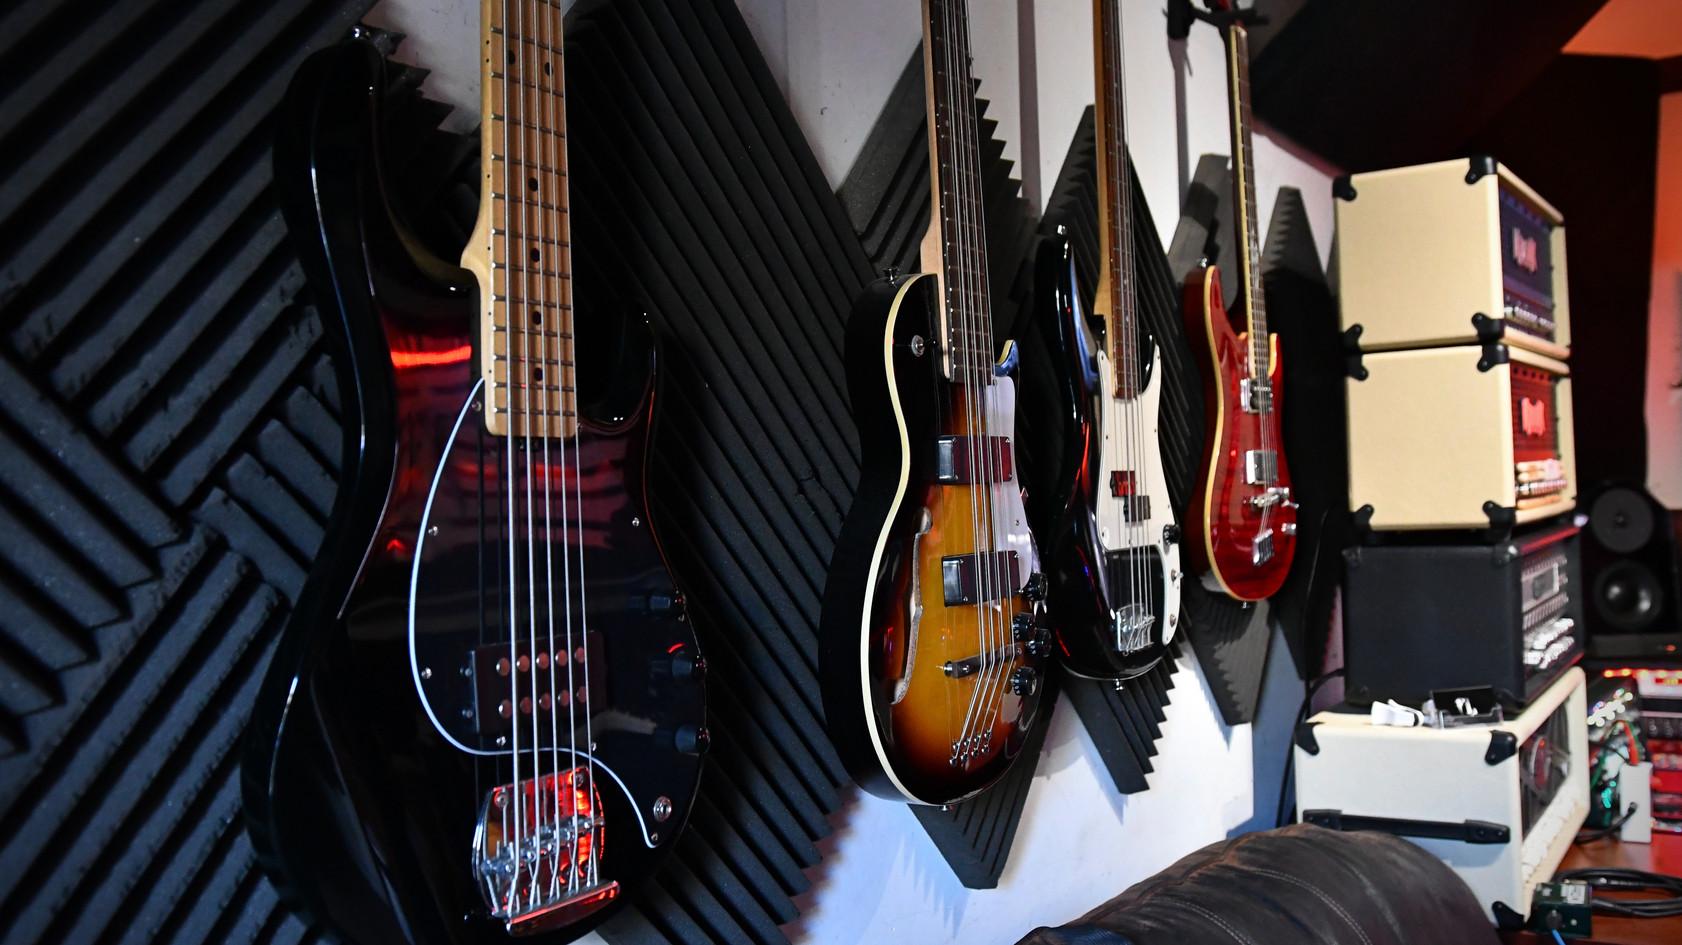 Guitars Edited.JPG